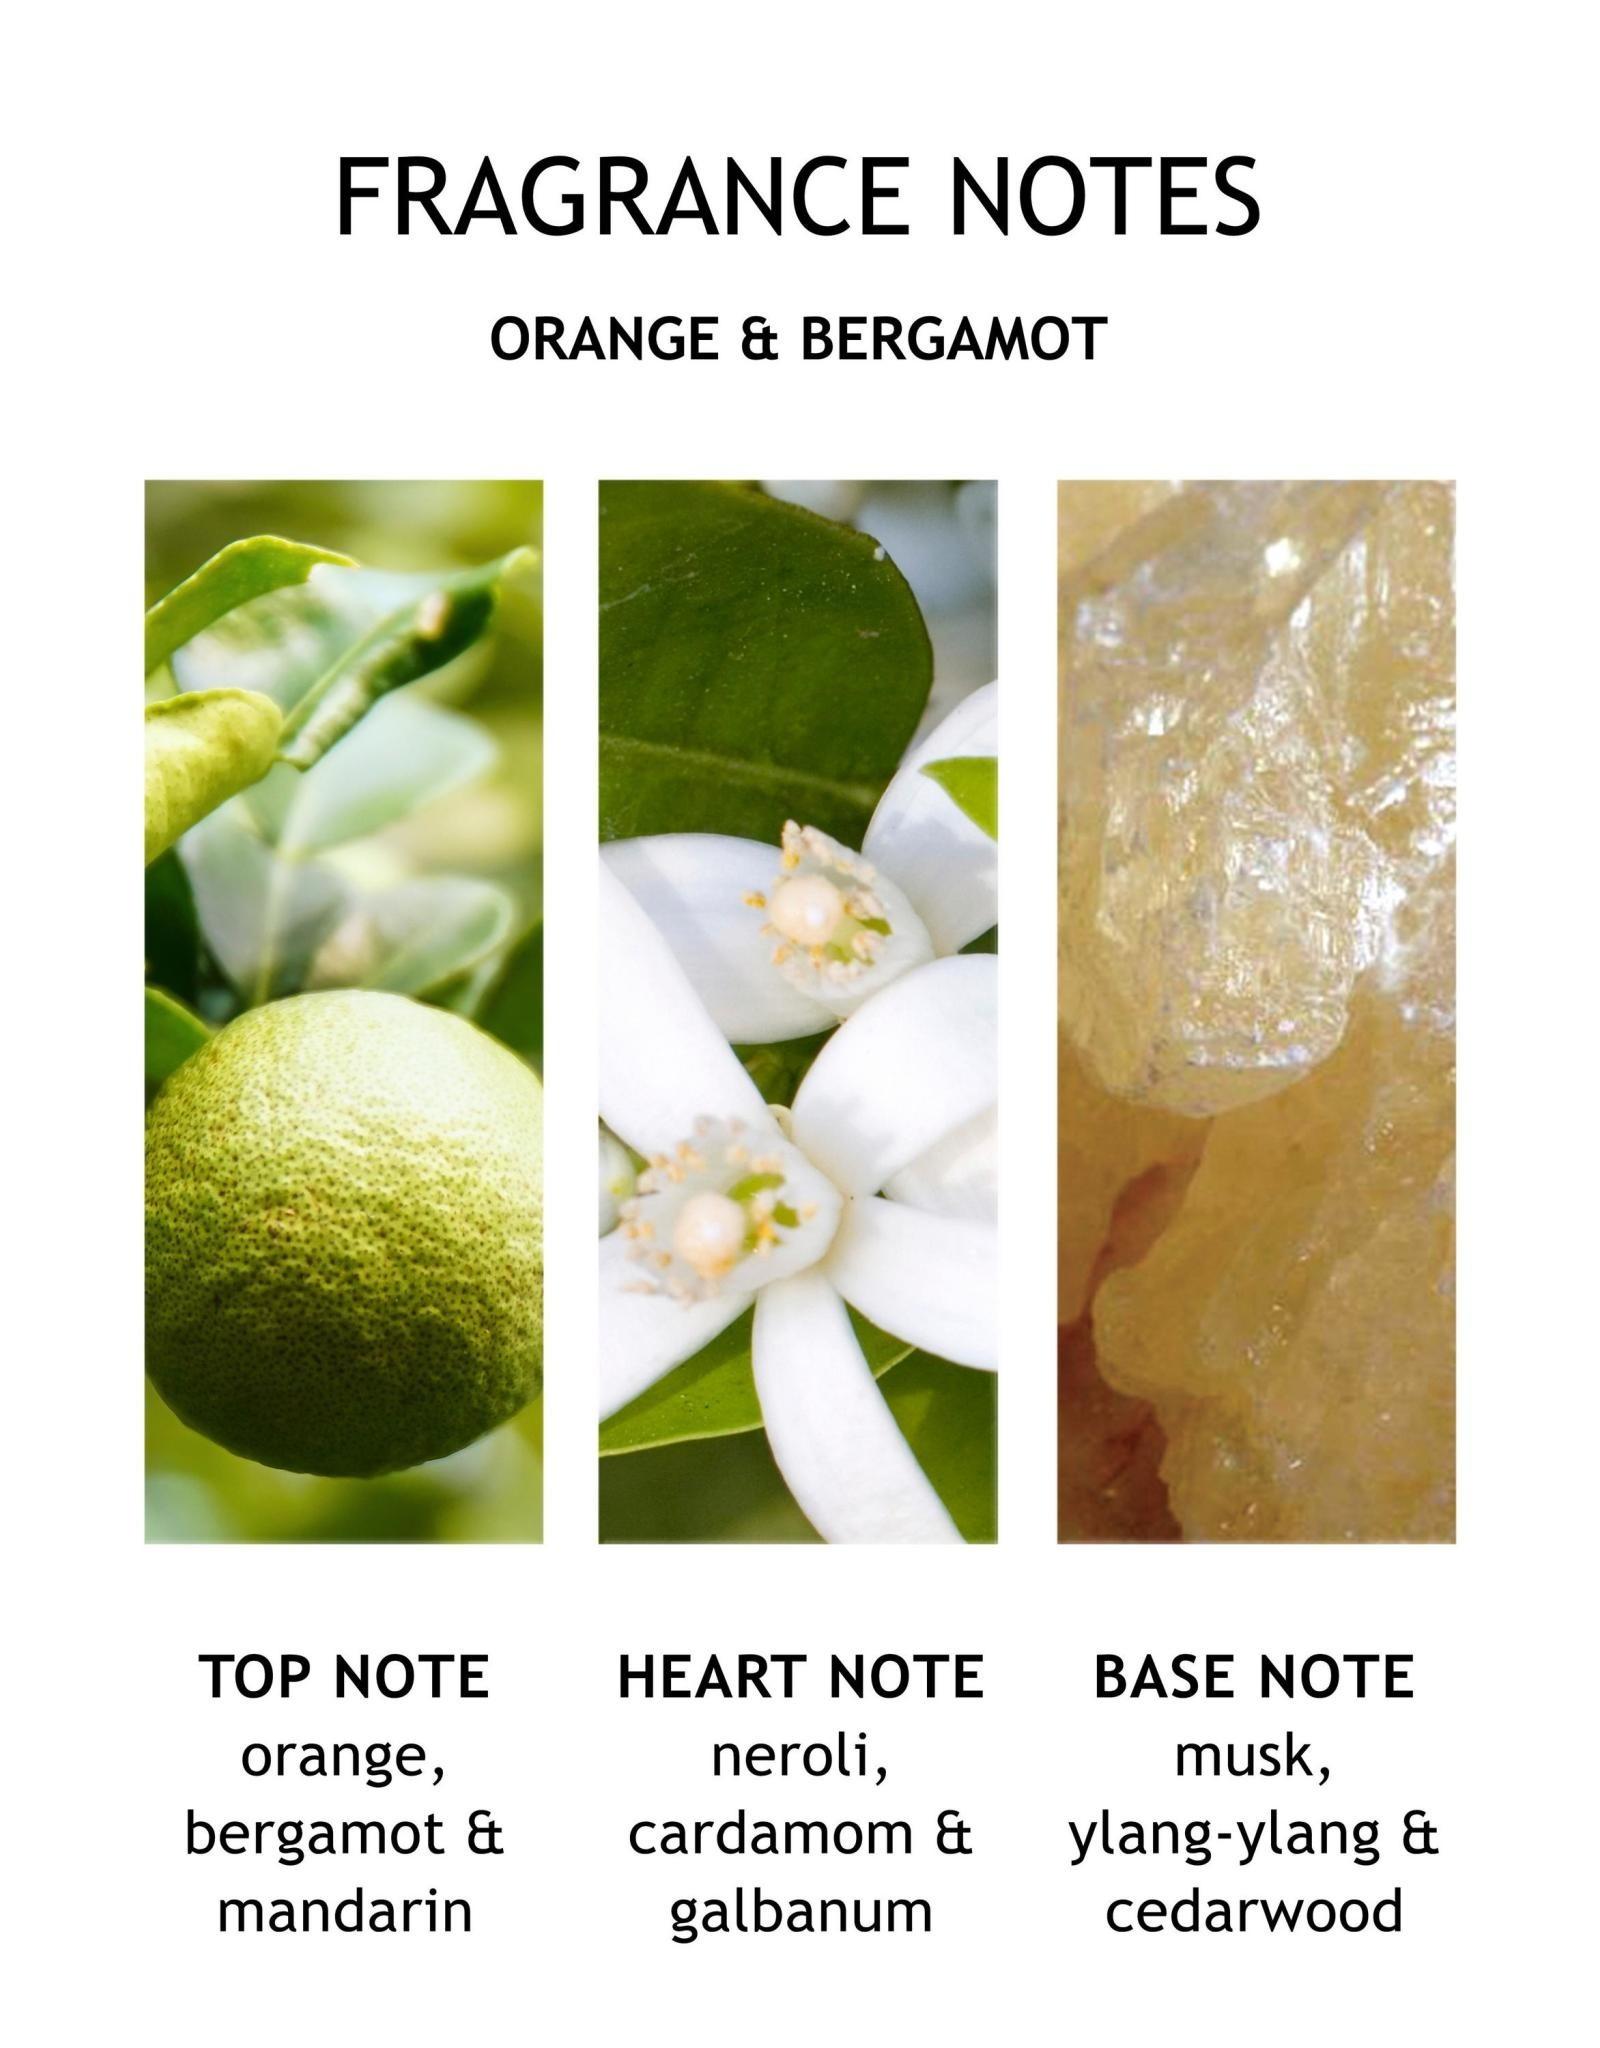 MBL Hand Wash Orange + Bergmot